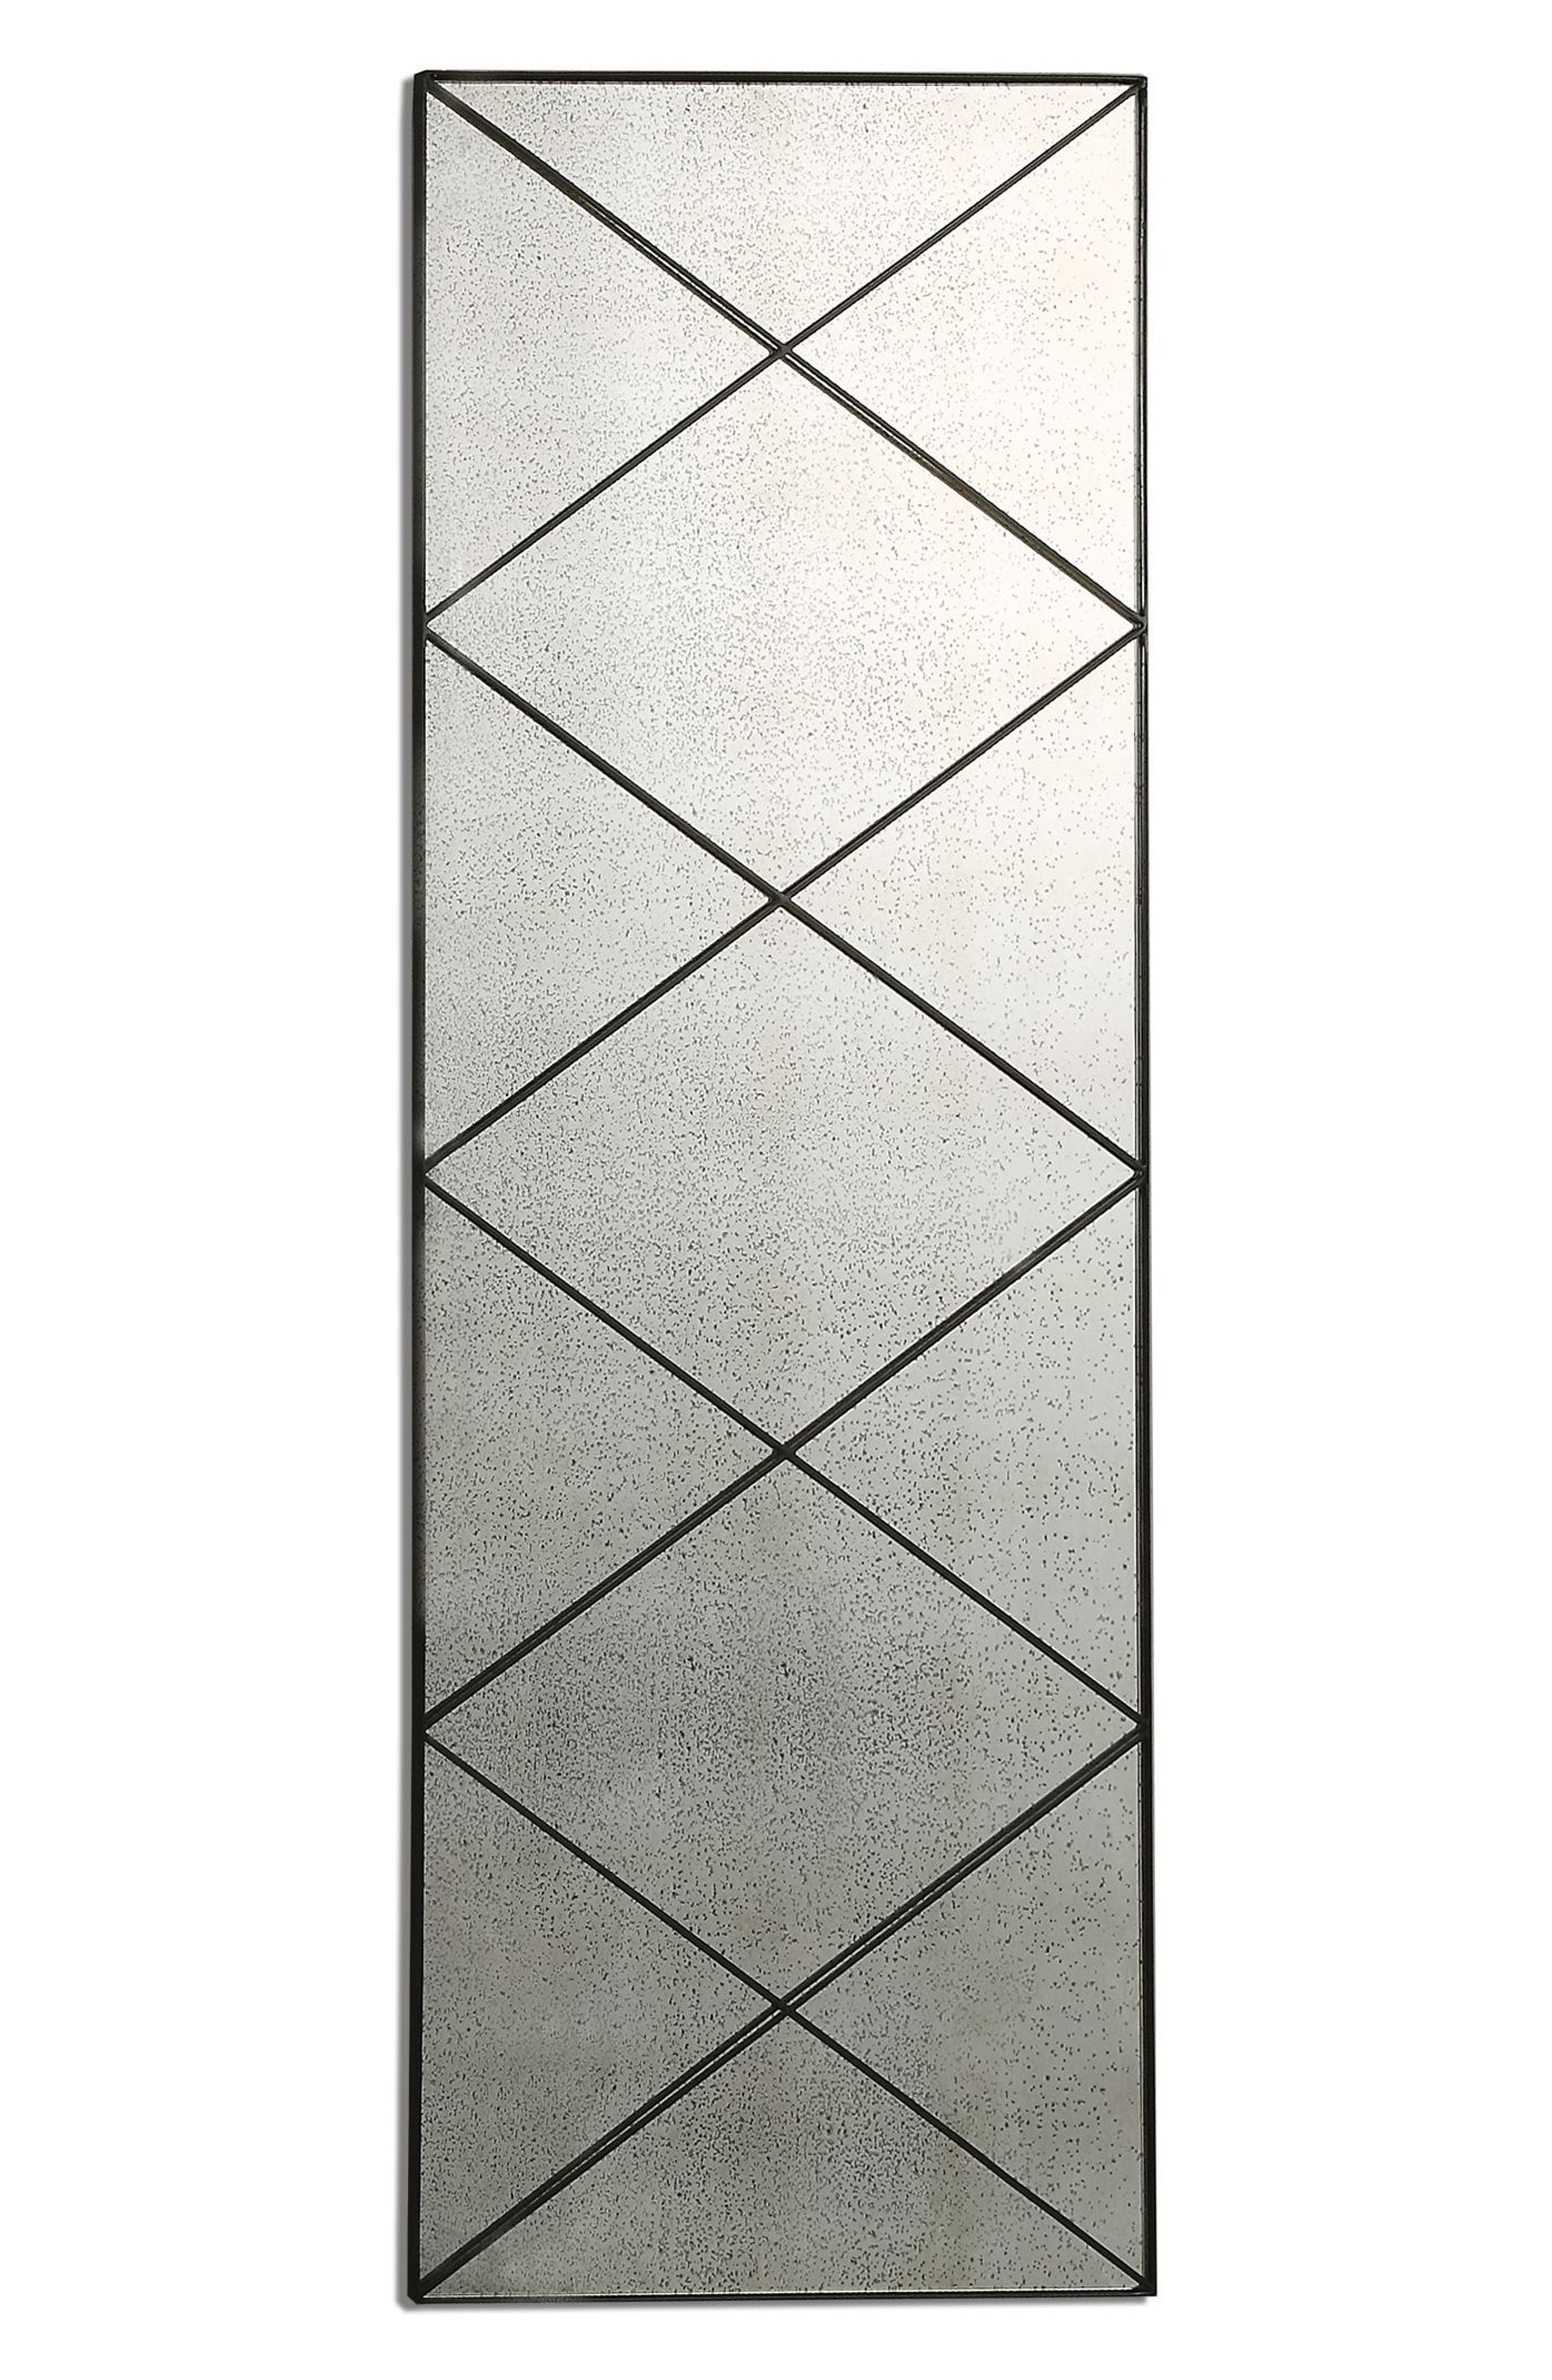 Emporia Wall Mirror,                             Main thumbnail 1, color,                             020